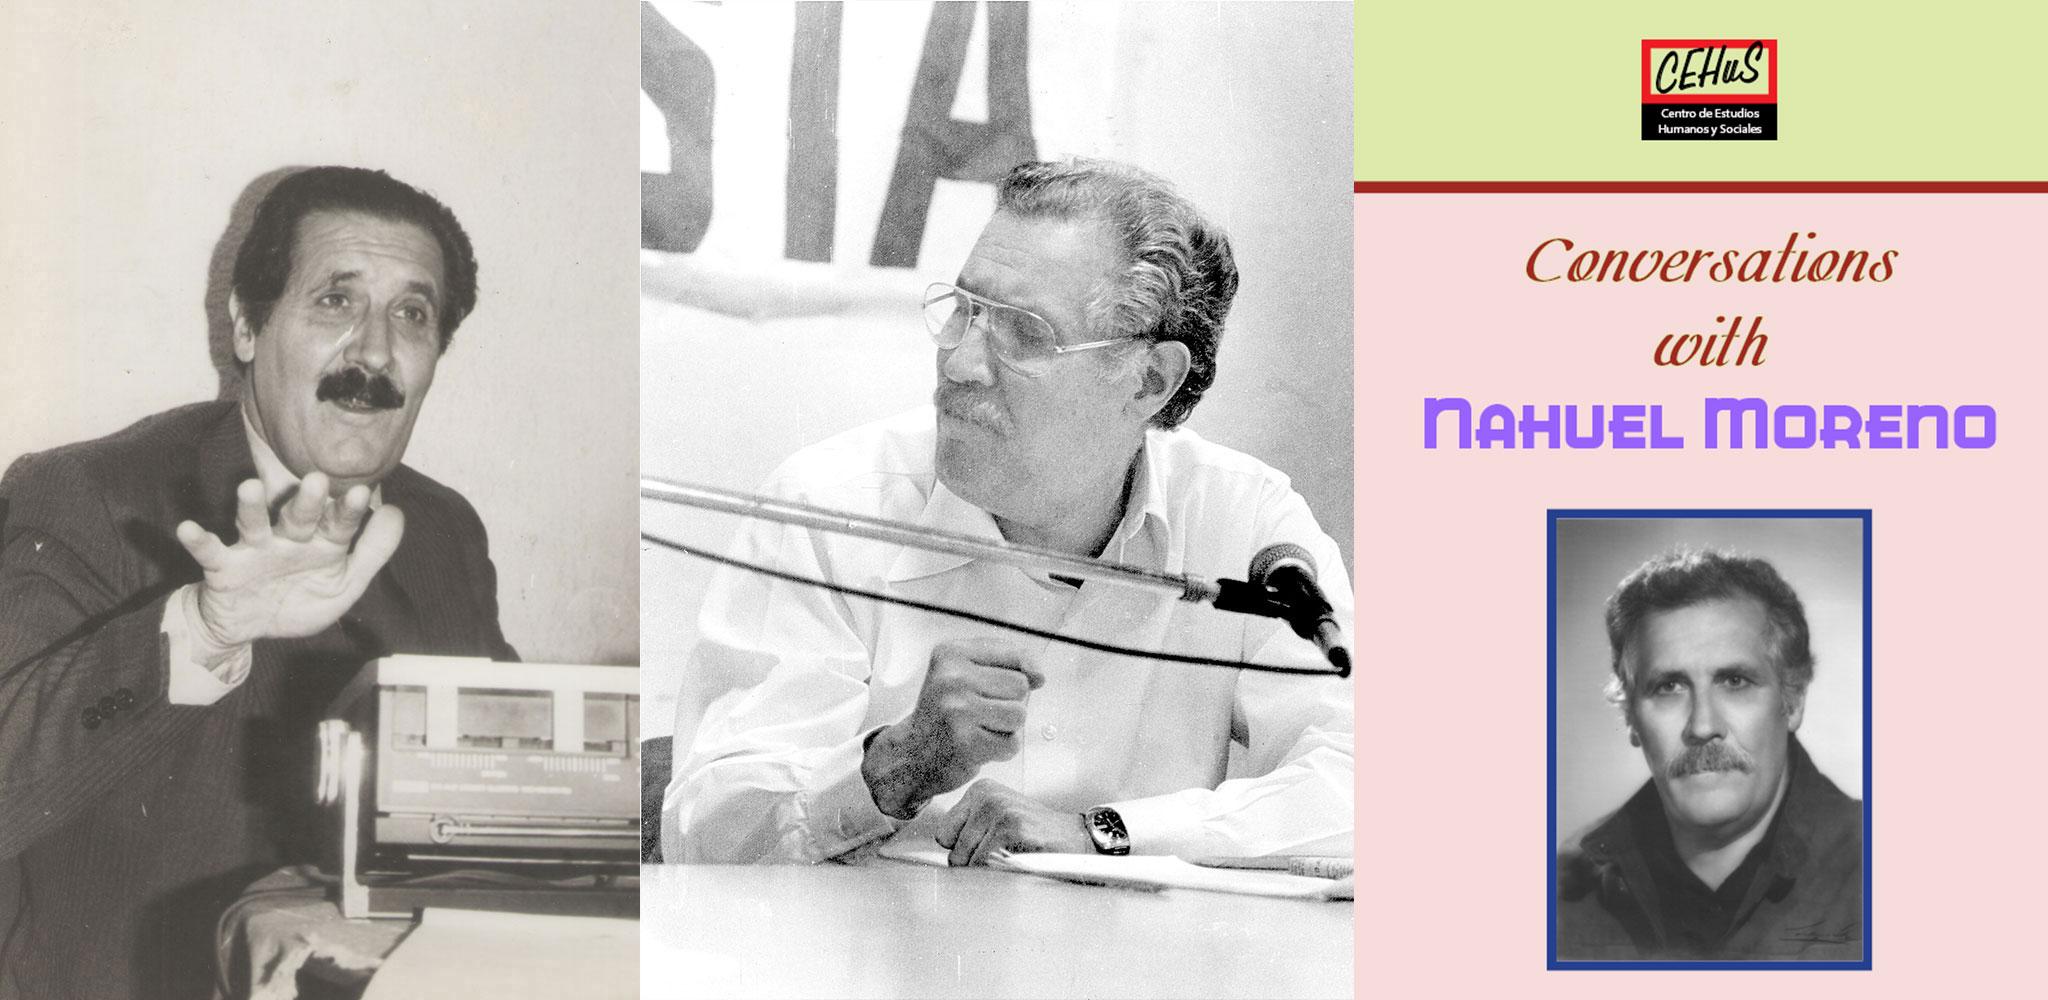 CONVERSATIONS WITH NAHUEL MORENO (1986)